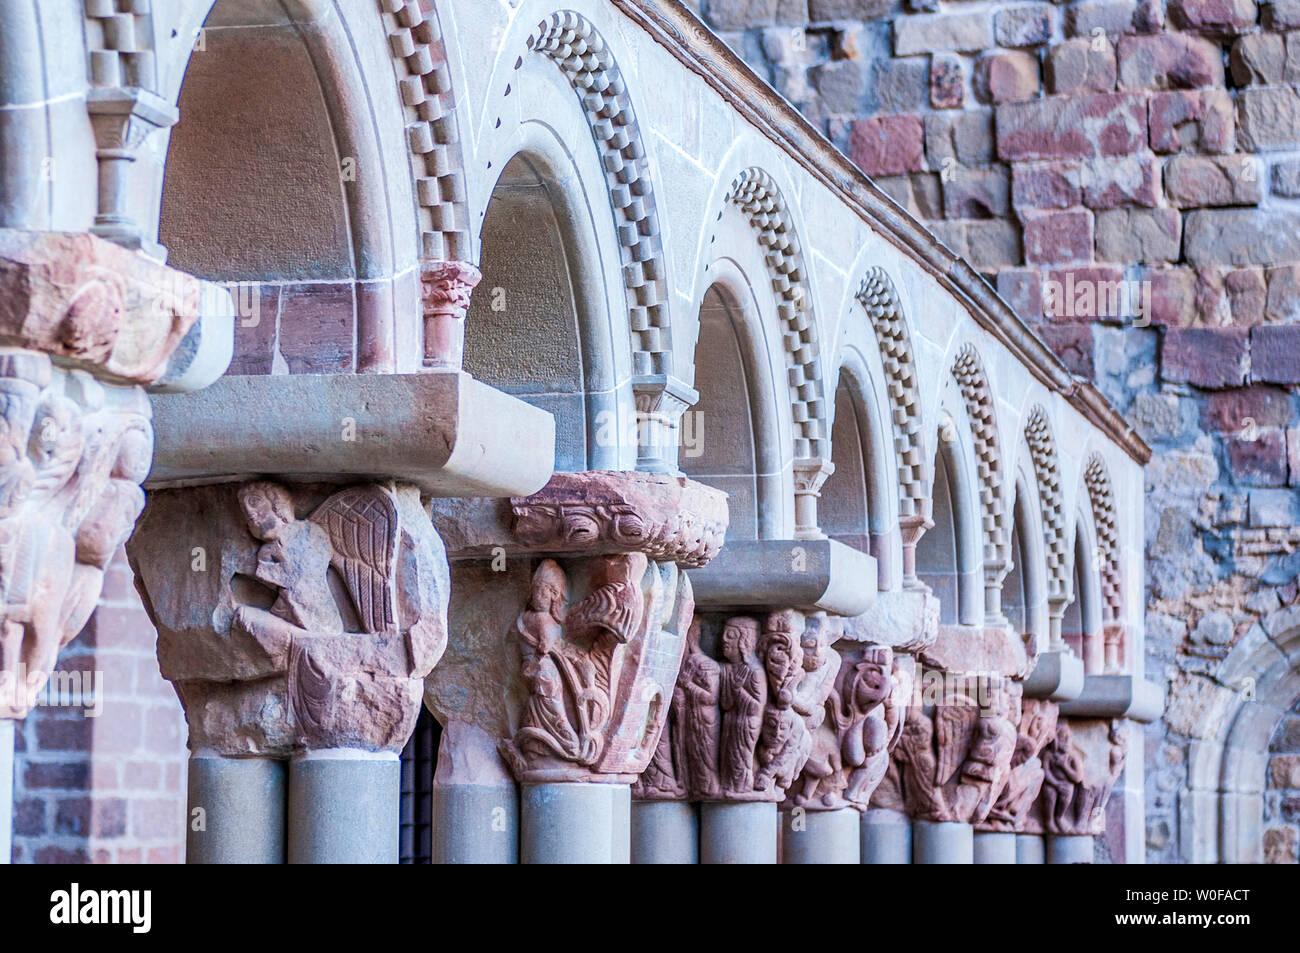 Spain, Pyrenees, Autonomous community of Aragon, old monastery of San Juan de la Pena (10th century), historiated capitals of the cloister (Saint James way) - Stock Image